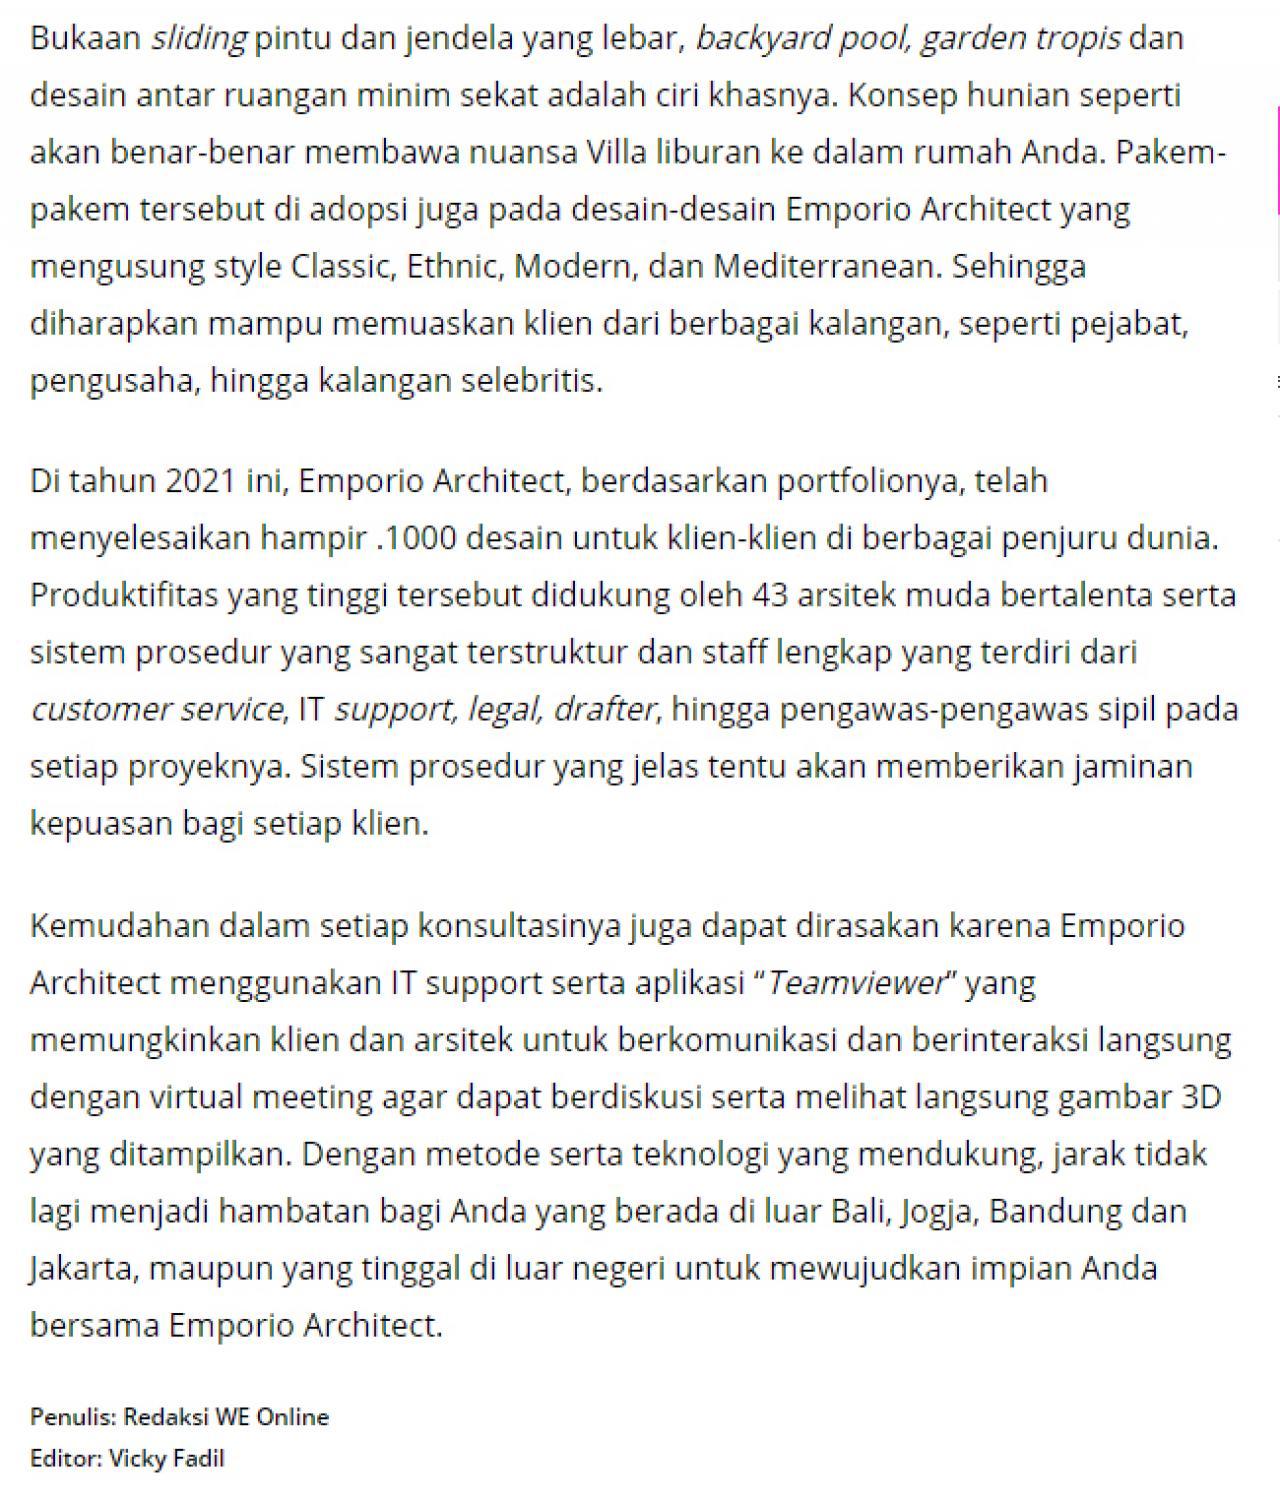 Ulasan Media WartaEkonomi.co.id - Moncer!! Emporio Architect Indonesia Tembus Pasar Internasional 2 2